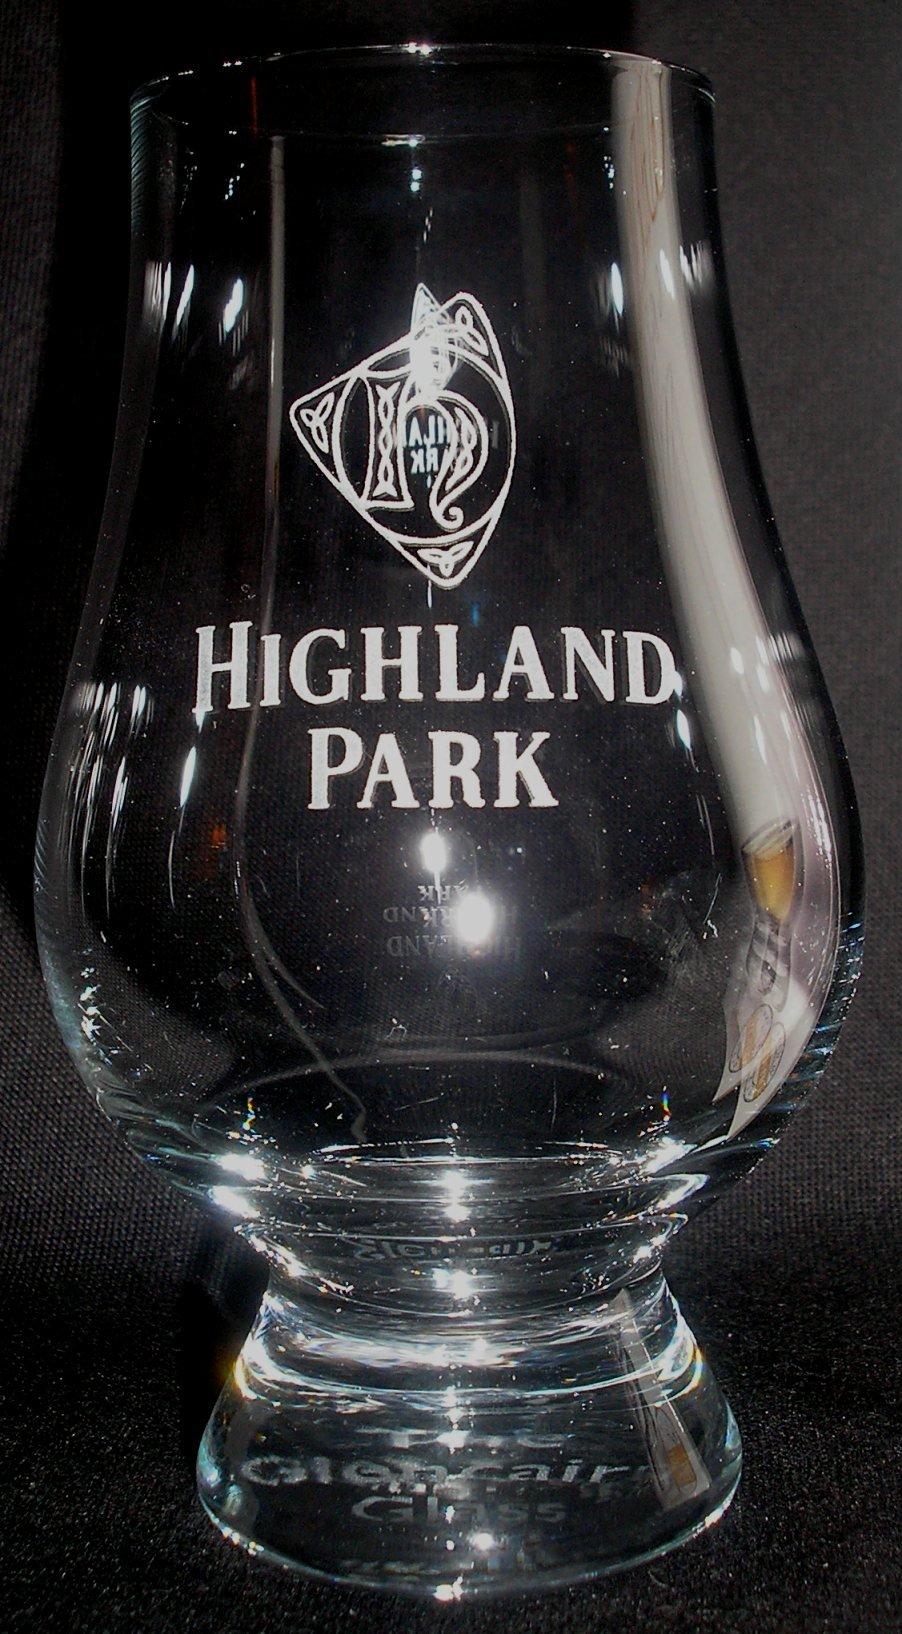 Highland Park Official Glencairn Scotch Malt Whisky Tasting Glass